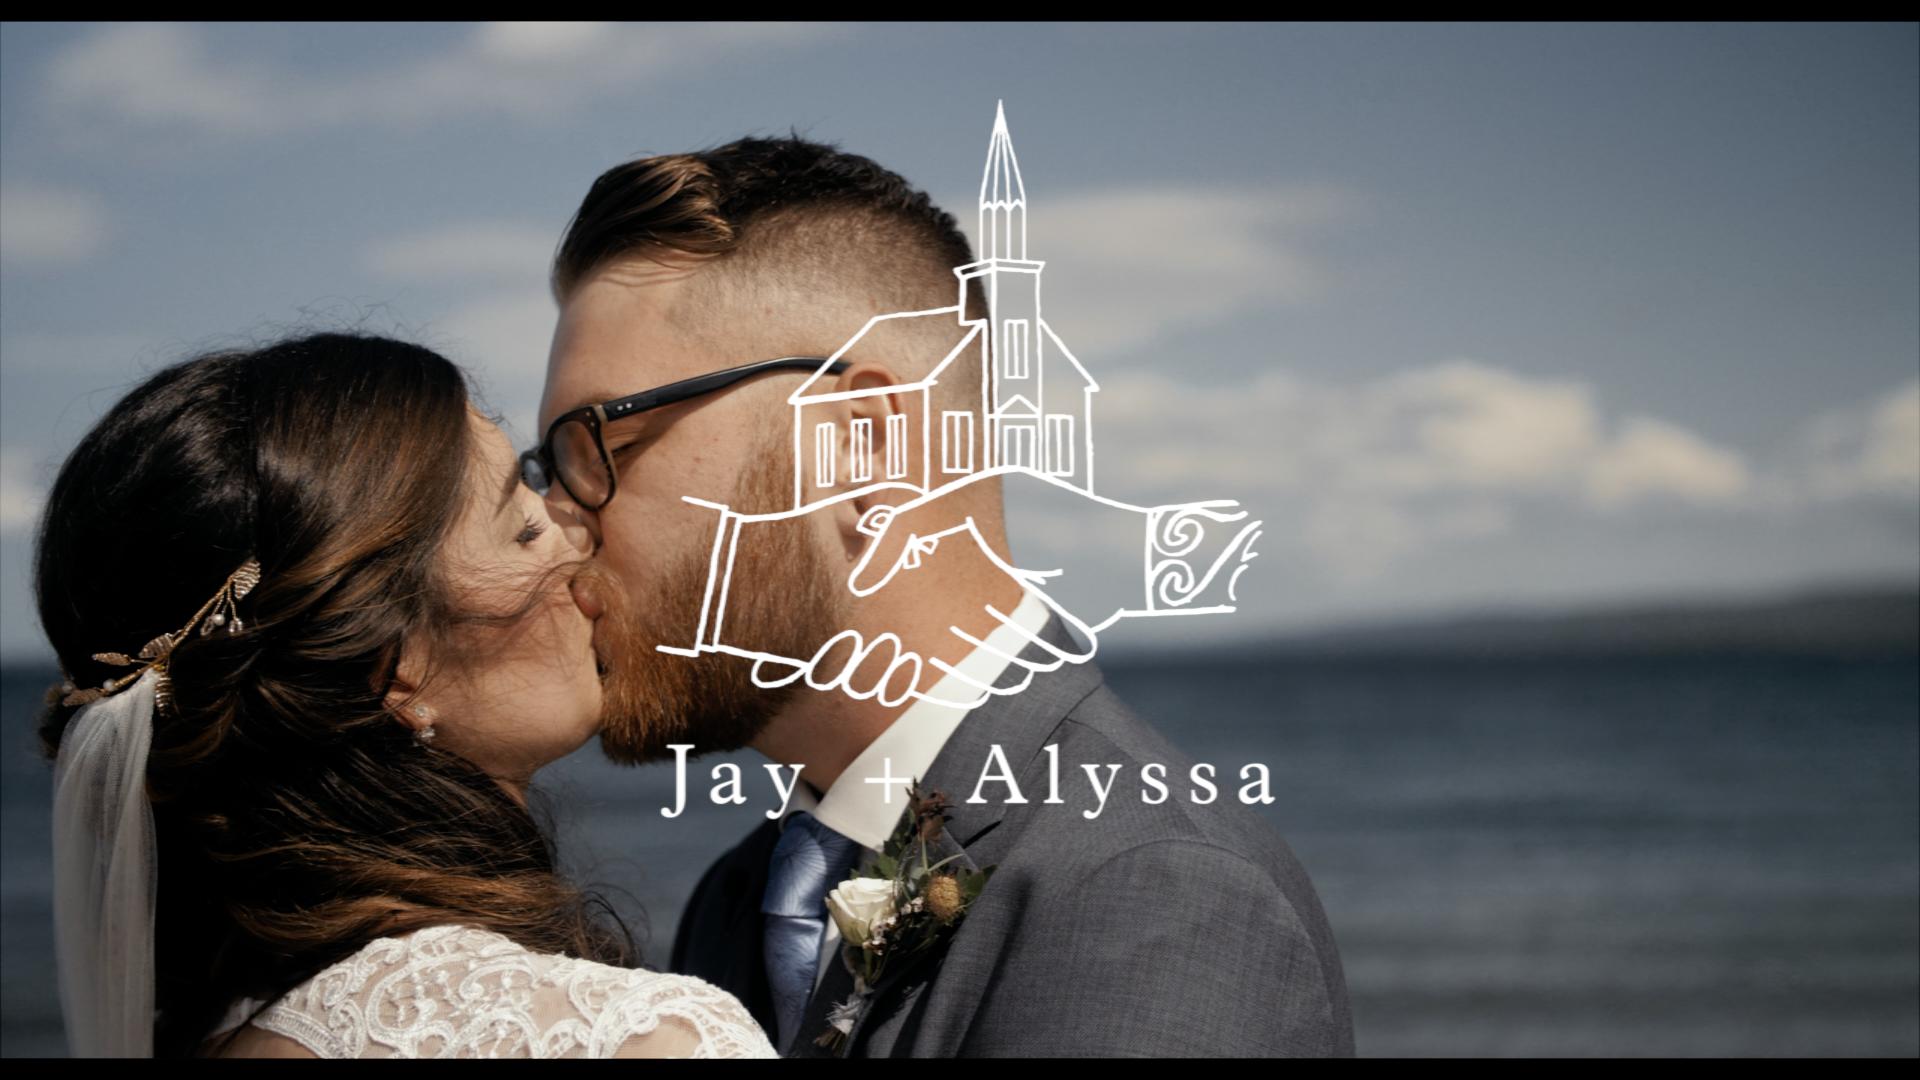 Alyssa + Jay | Iona, Canada | The Frolic & Folk Pub & Grill